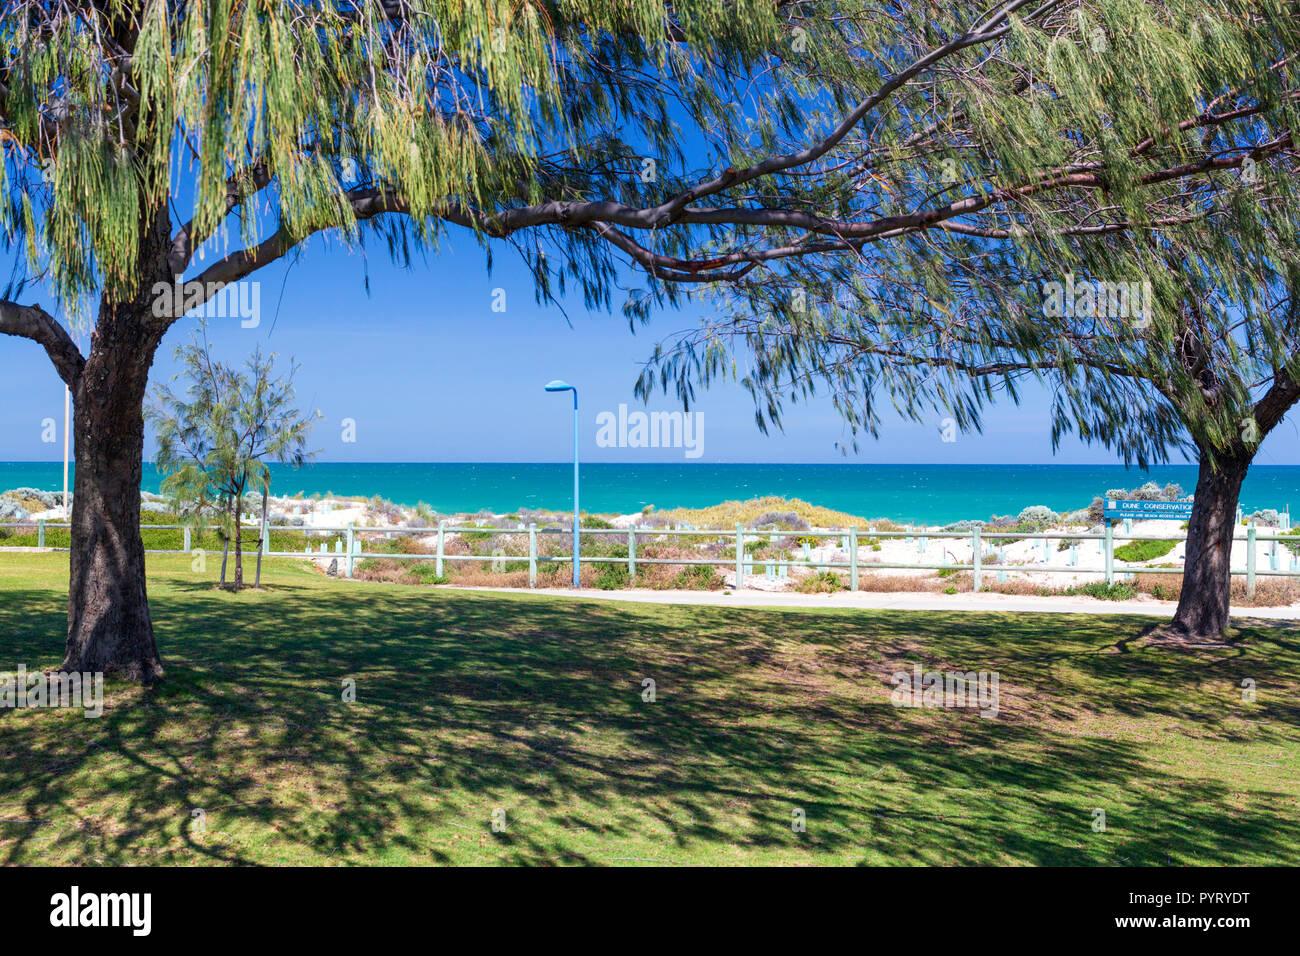 Swamp Sheoak (Casuarina obesa) providing shade in parkland beside Trigg Beach. Perth, Western Australia - Stock Image